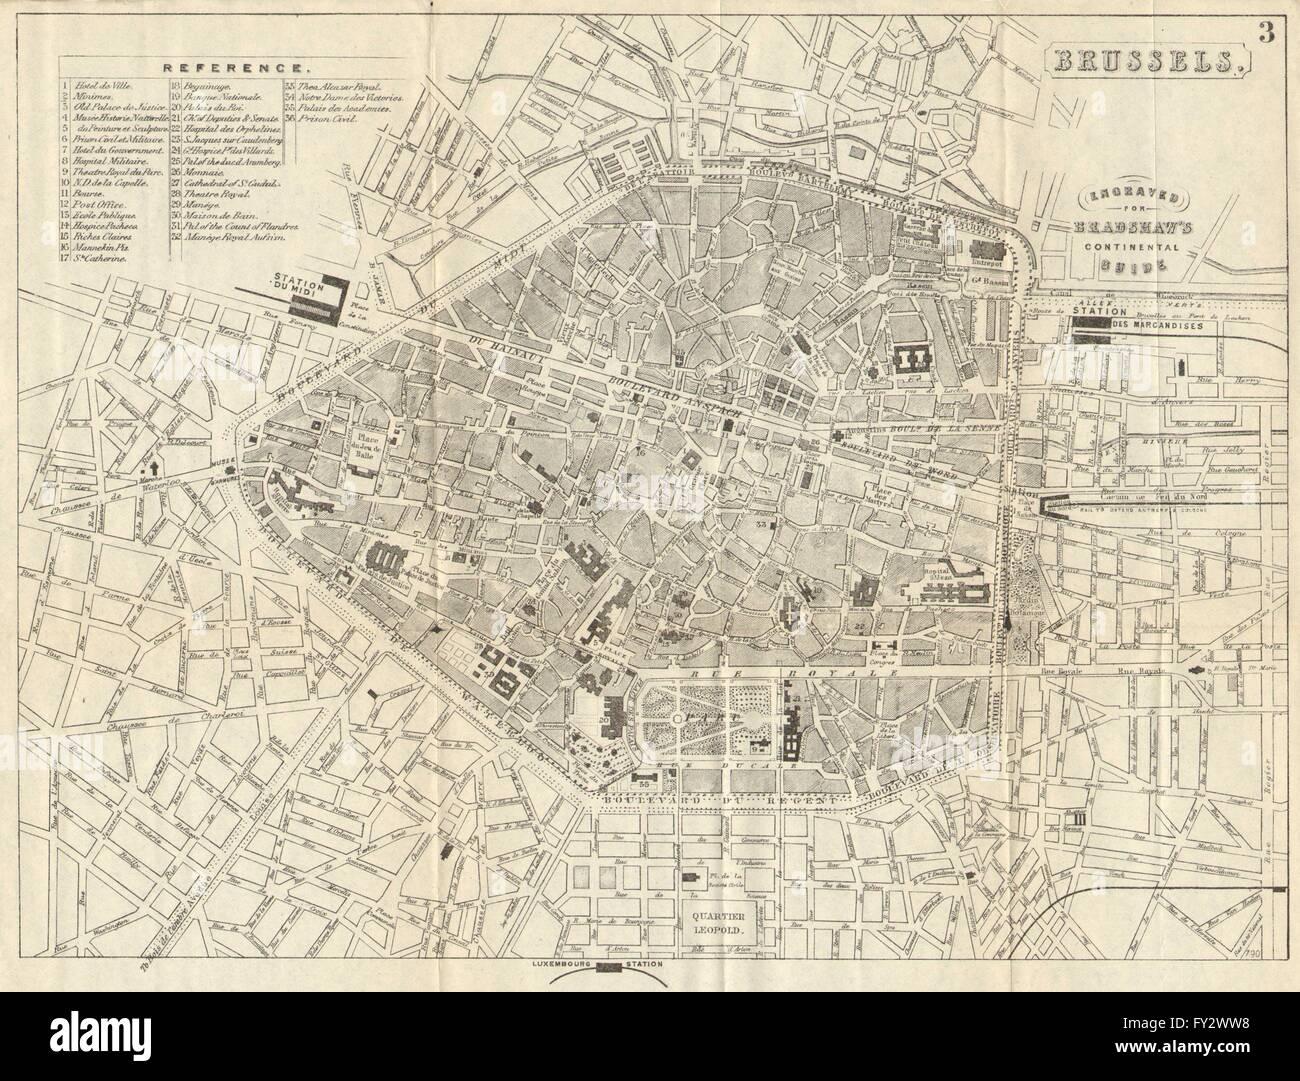 BRUSSELS BRUSSEL BRUXELLES Antique Town Plan City Map Belgium - Brussels belgium map